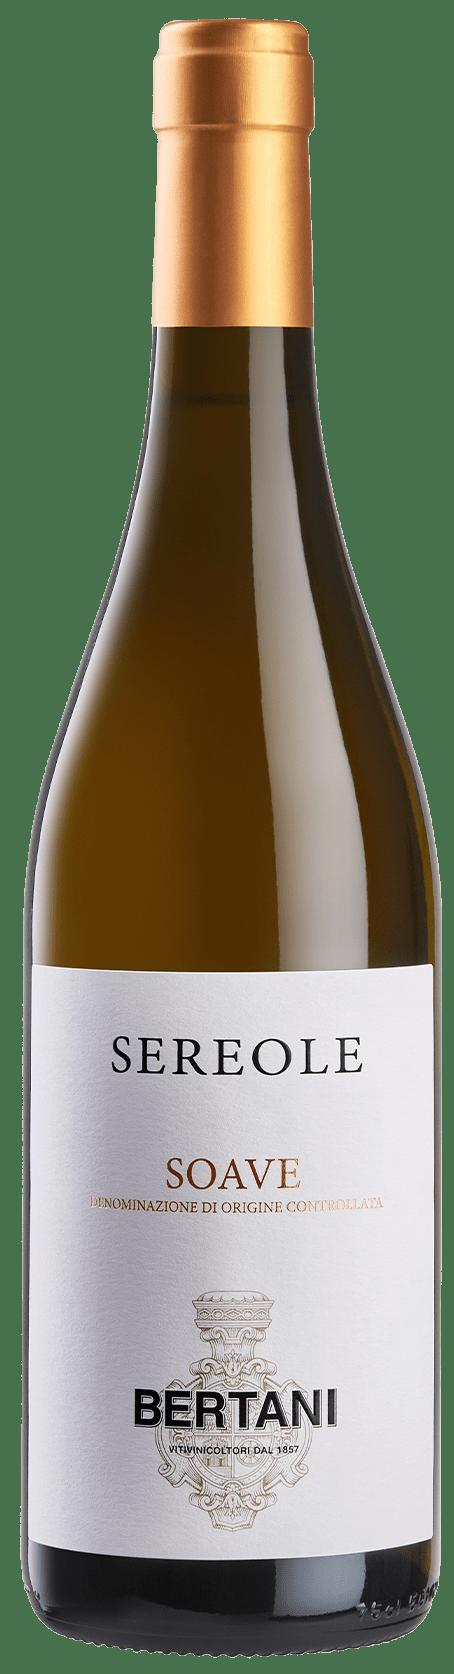 Sereole